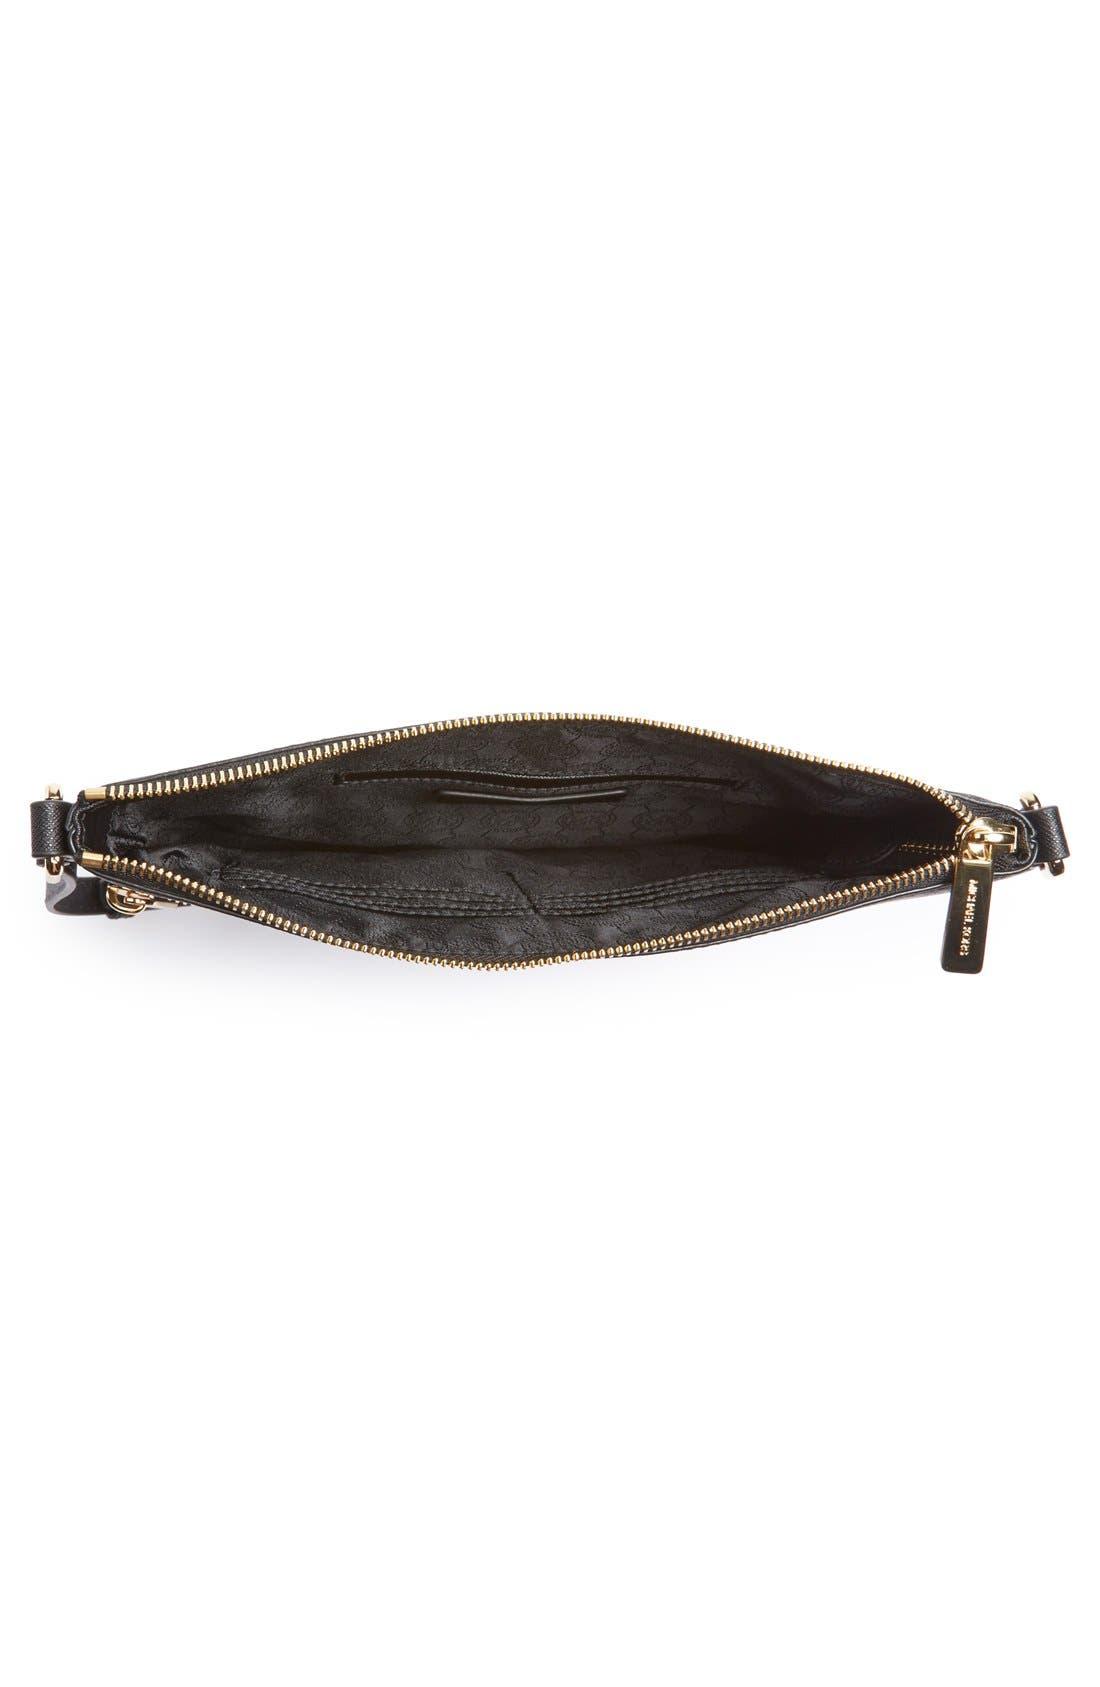 'Bedford' Saffiano Leather Flat Crossbody Bag,                             Alternate thumbnail 5, color,                             001